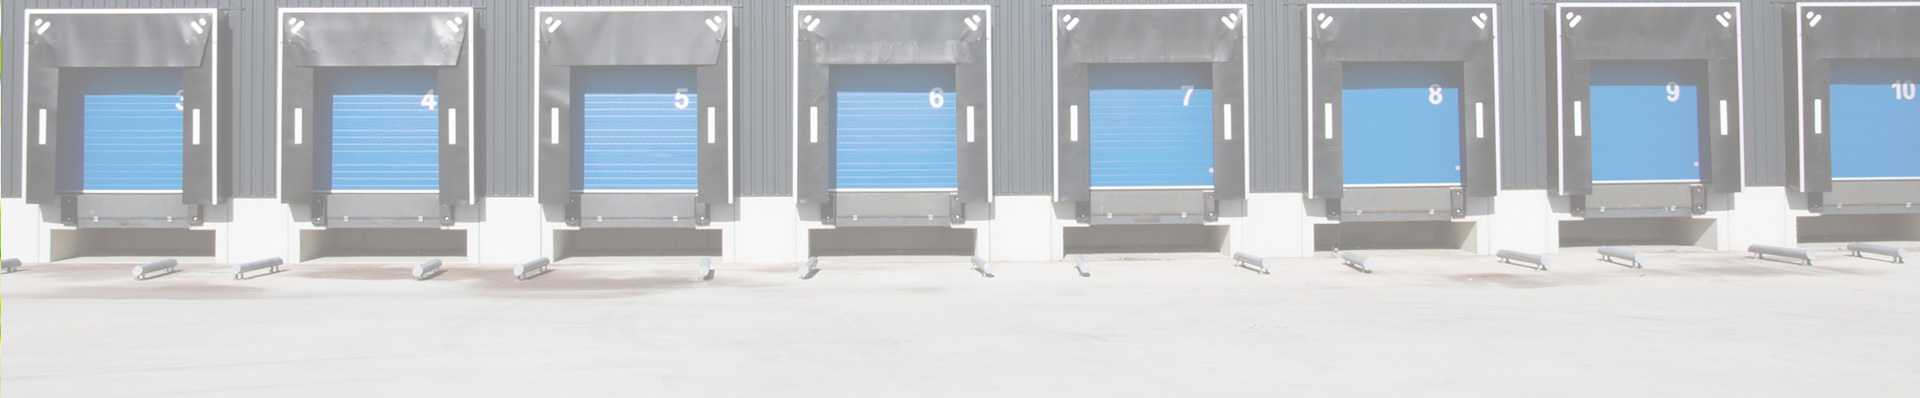 dock_bays1